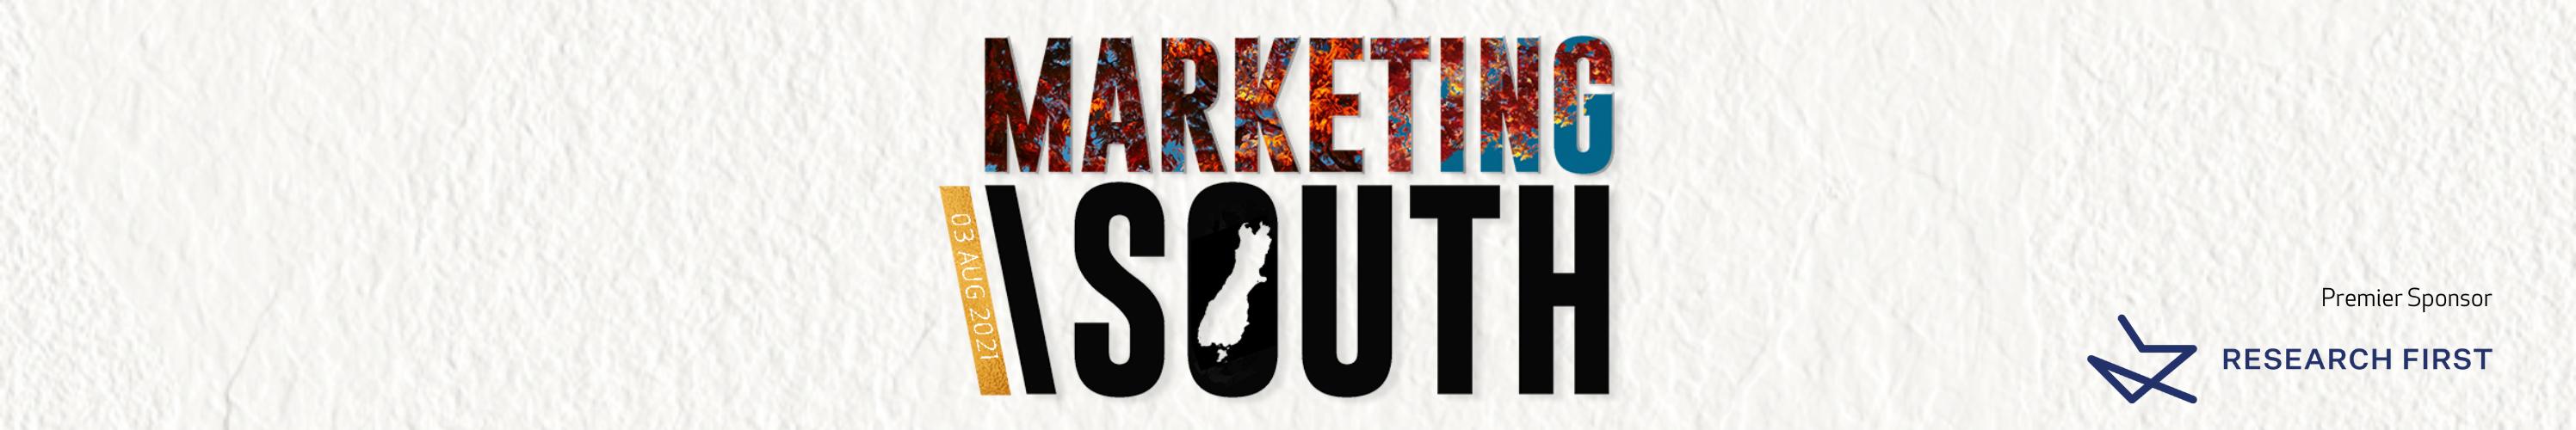 MSouth Web Banner (3)